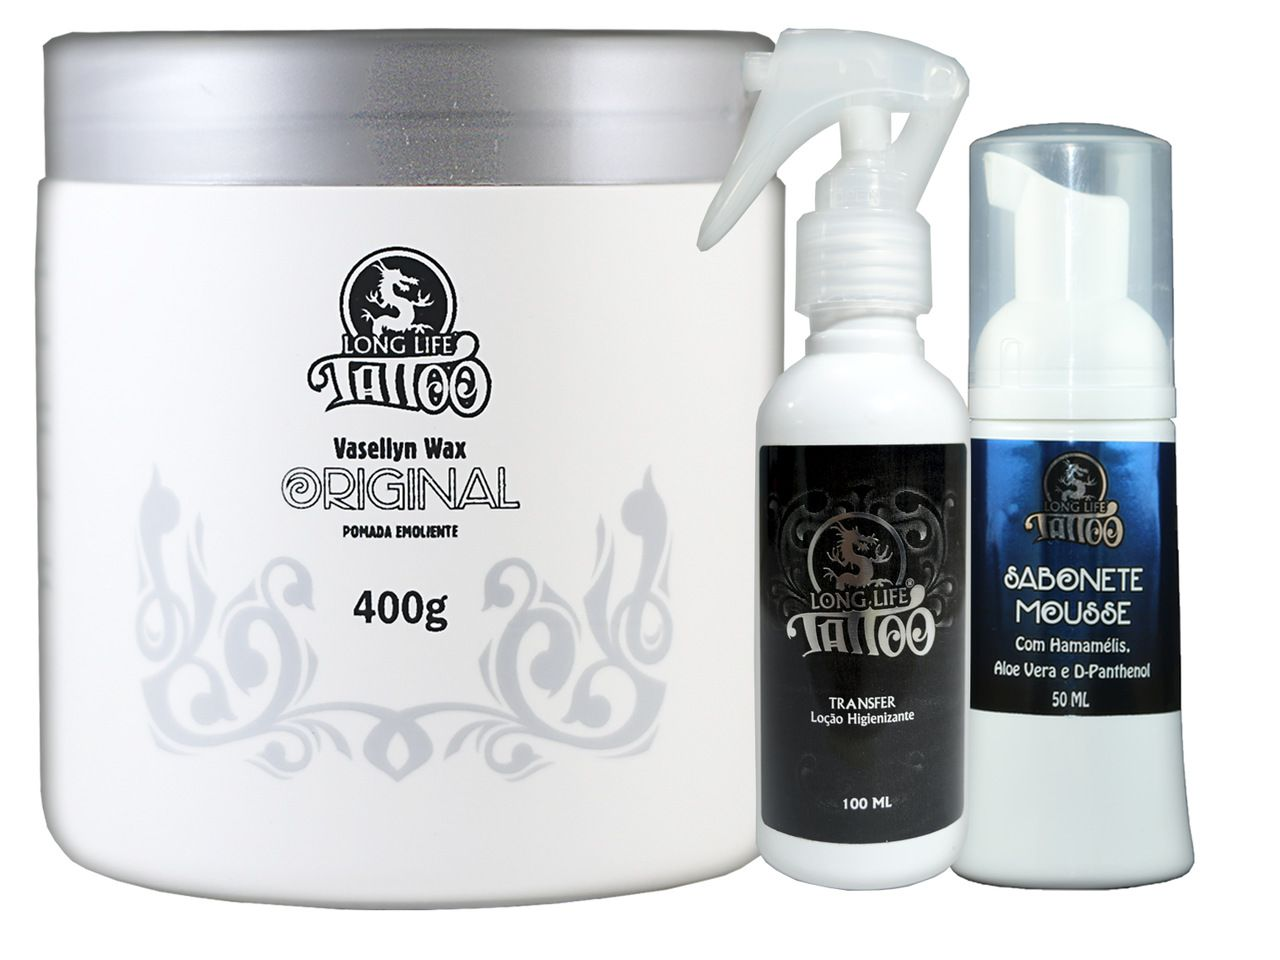 Vasellyn Wax Original 400g + Sabonete Mousse 50 ml + Transfer Loção 100 ml